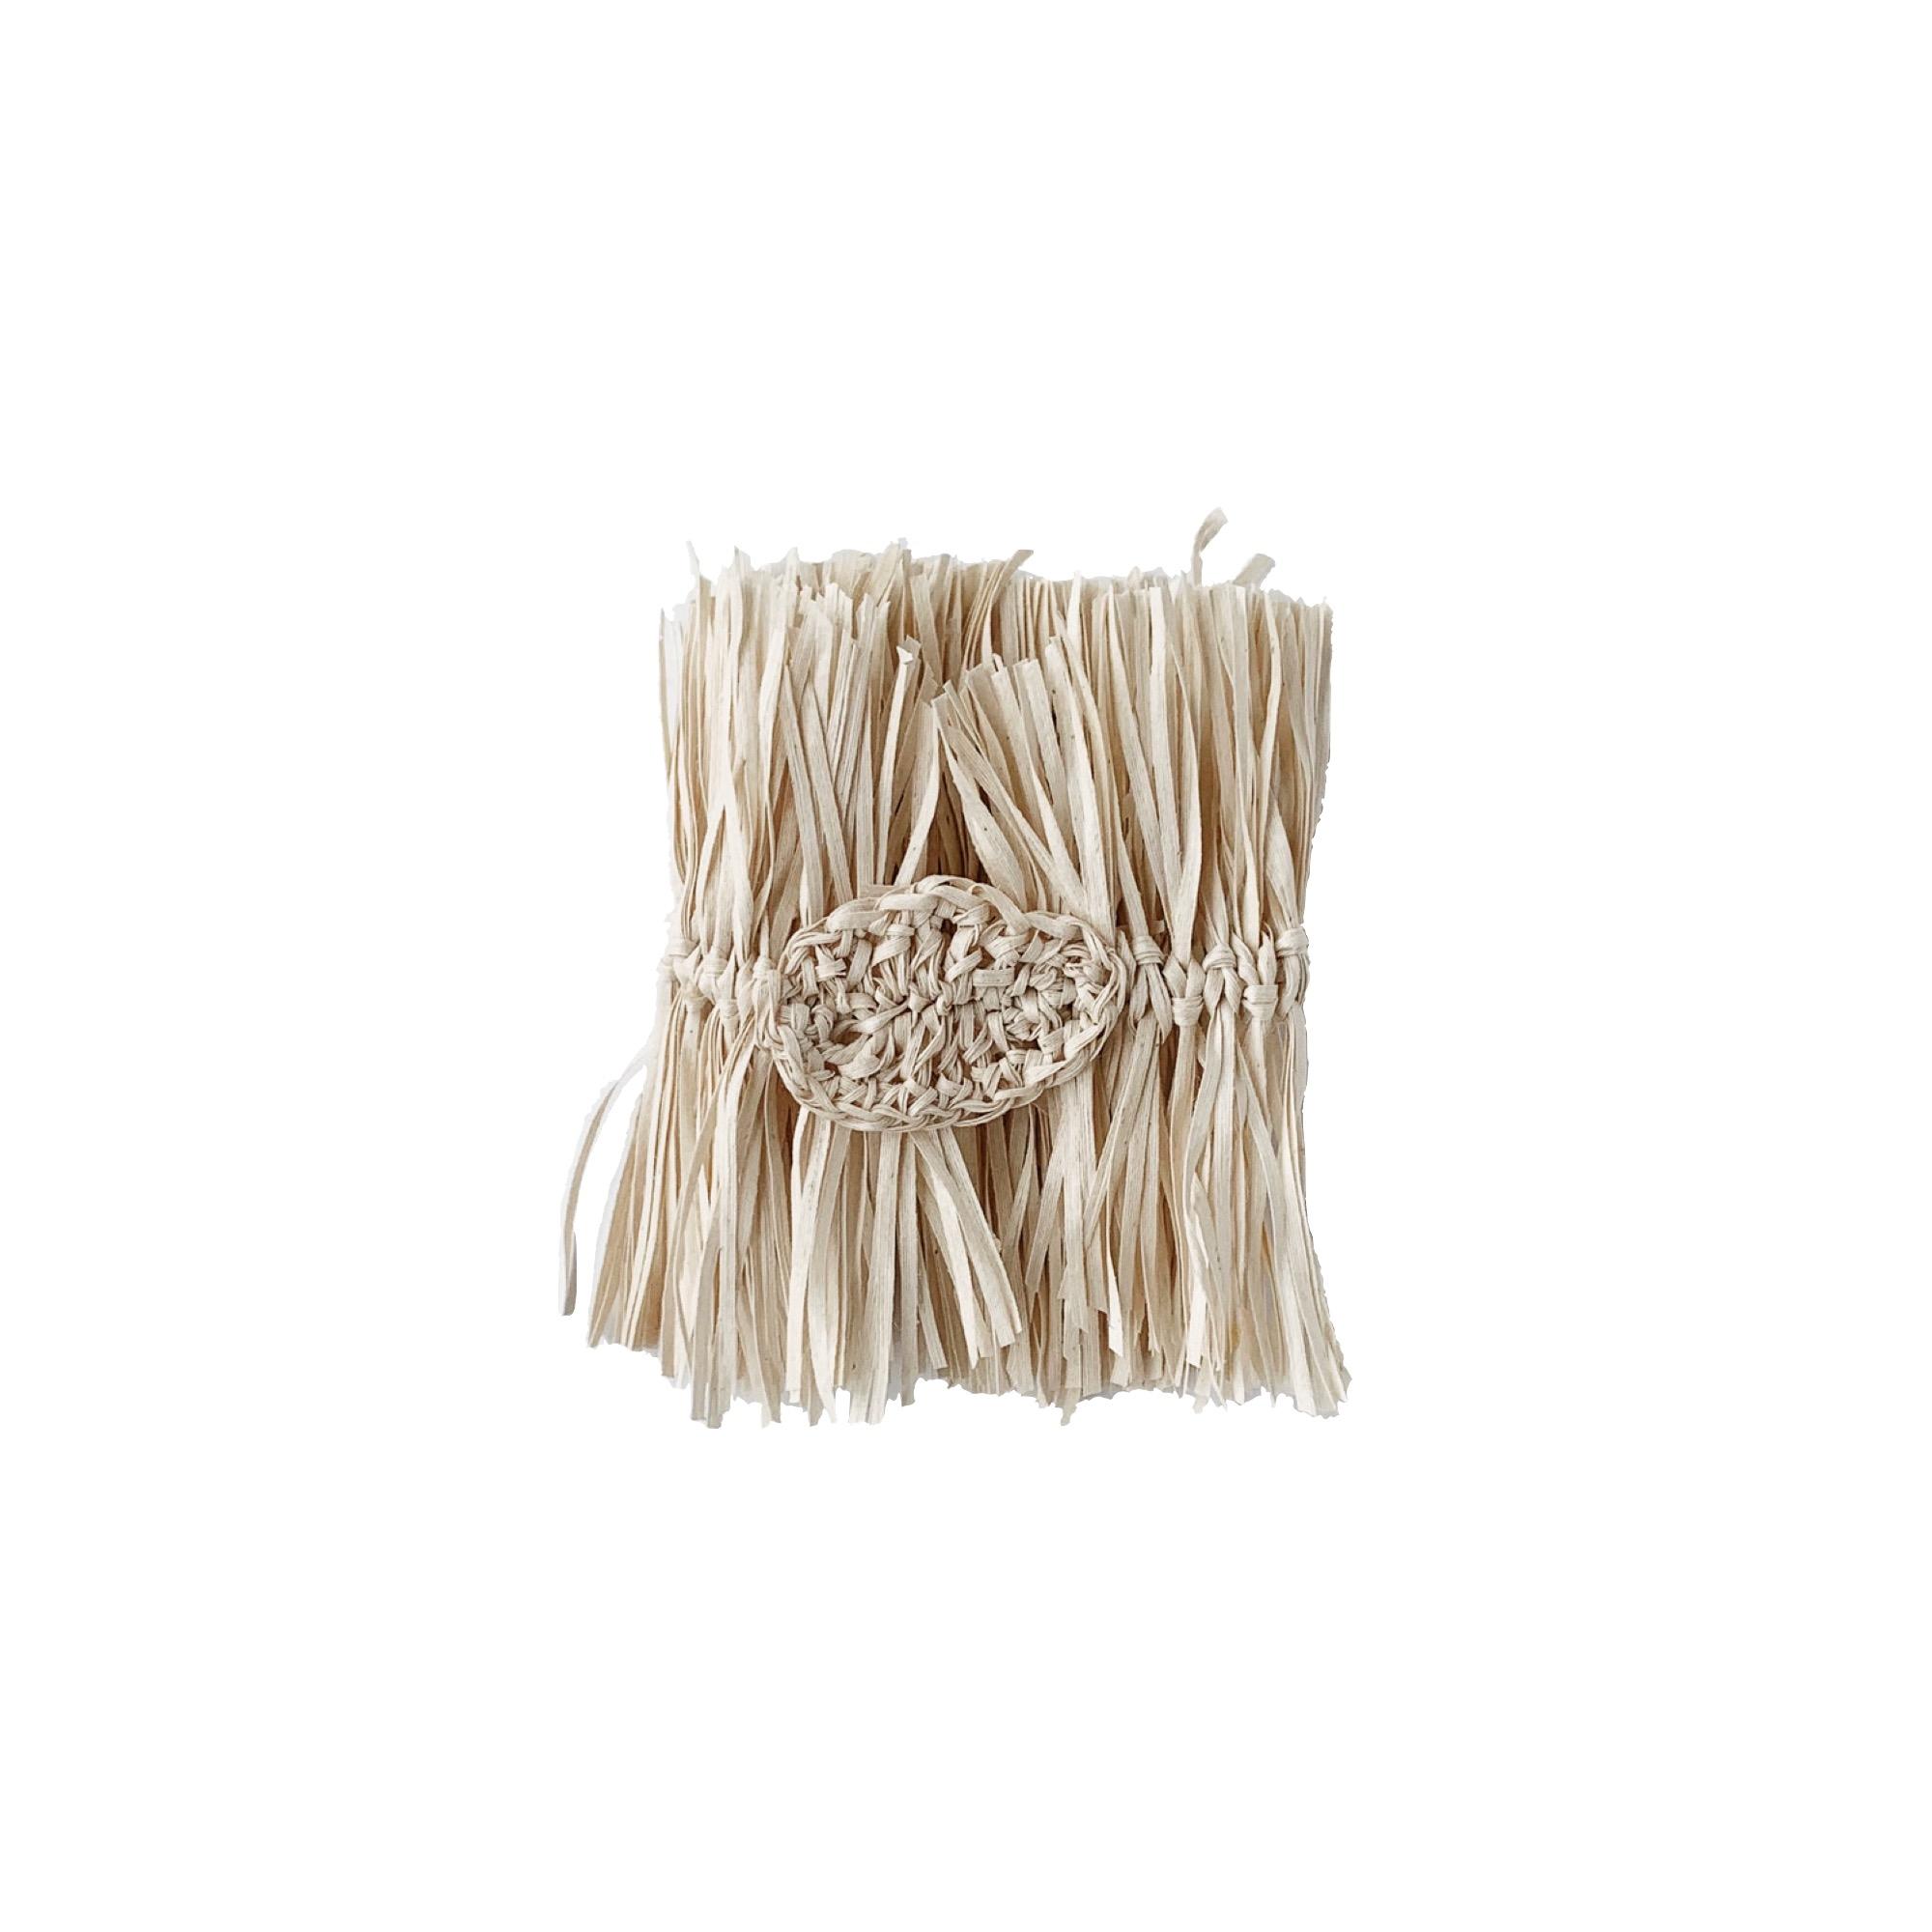 Duna Handmade Napkin Ring